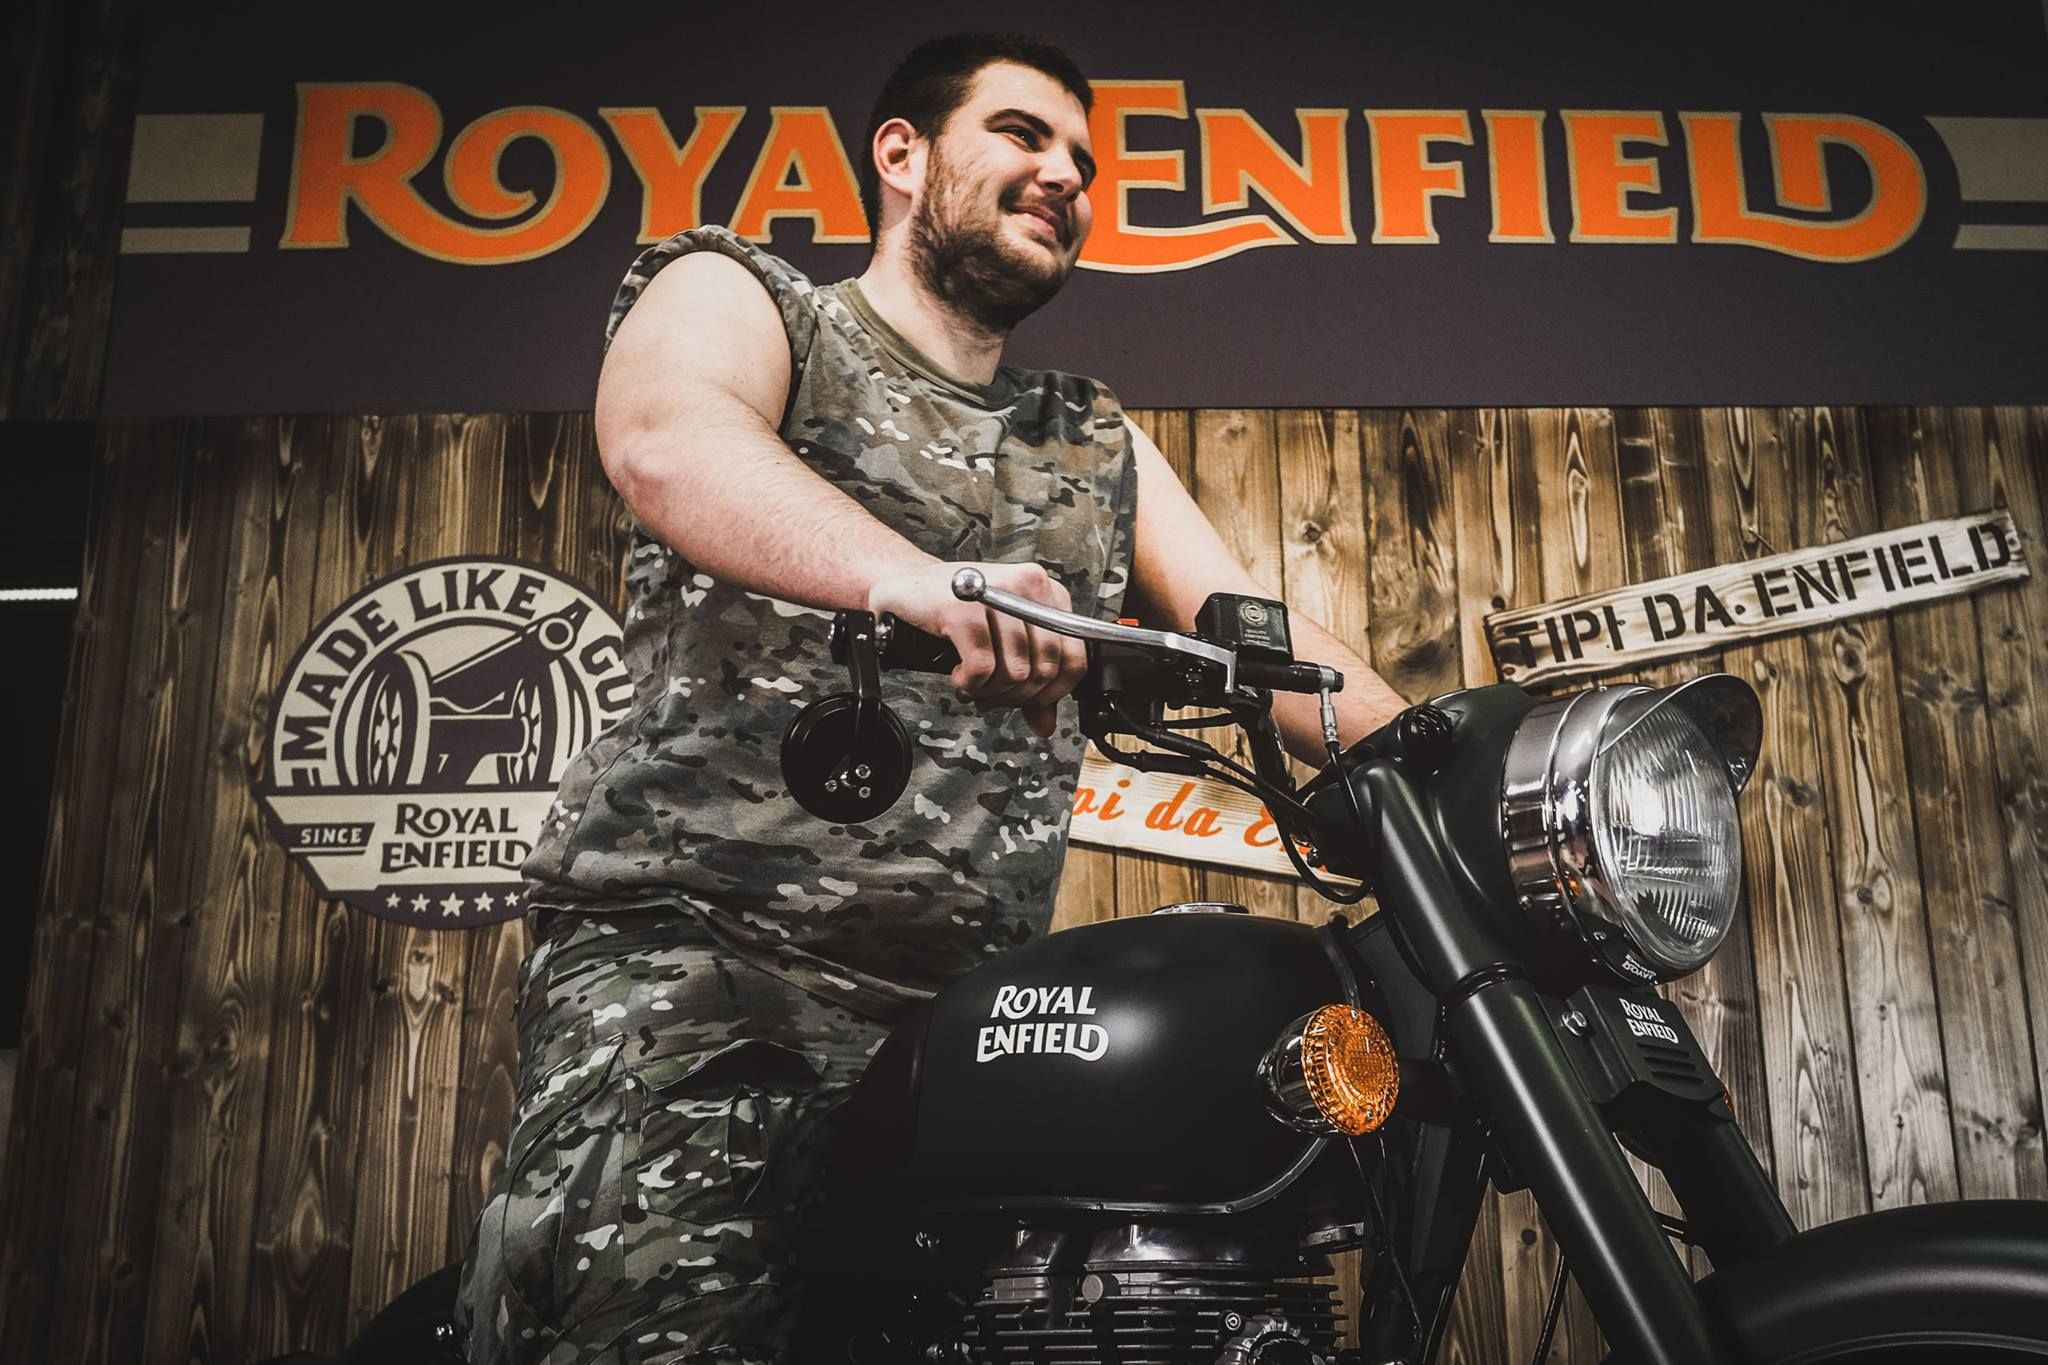 royal-enfield-piacenza-moruzzi-moto-wonderland-campagna-promo-5